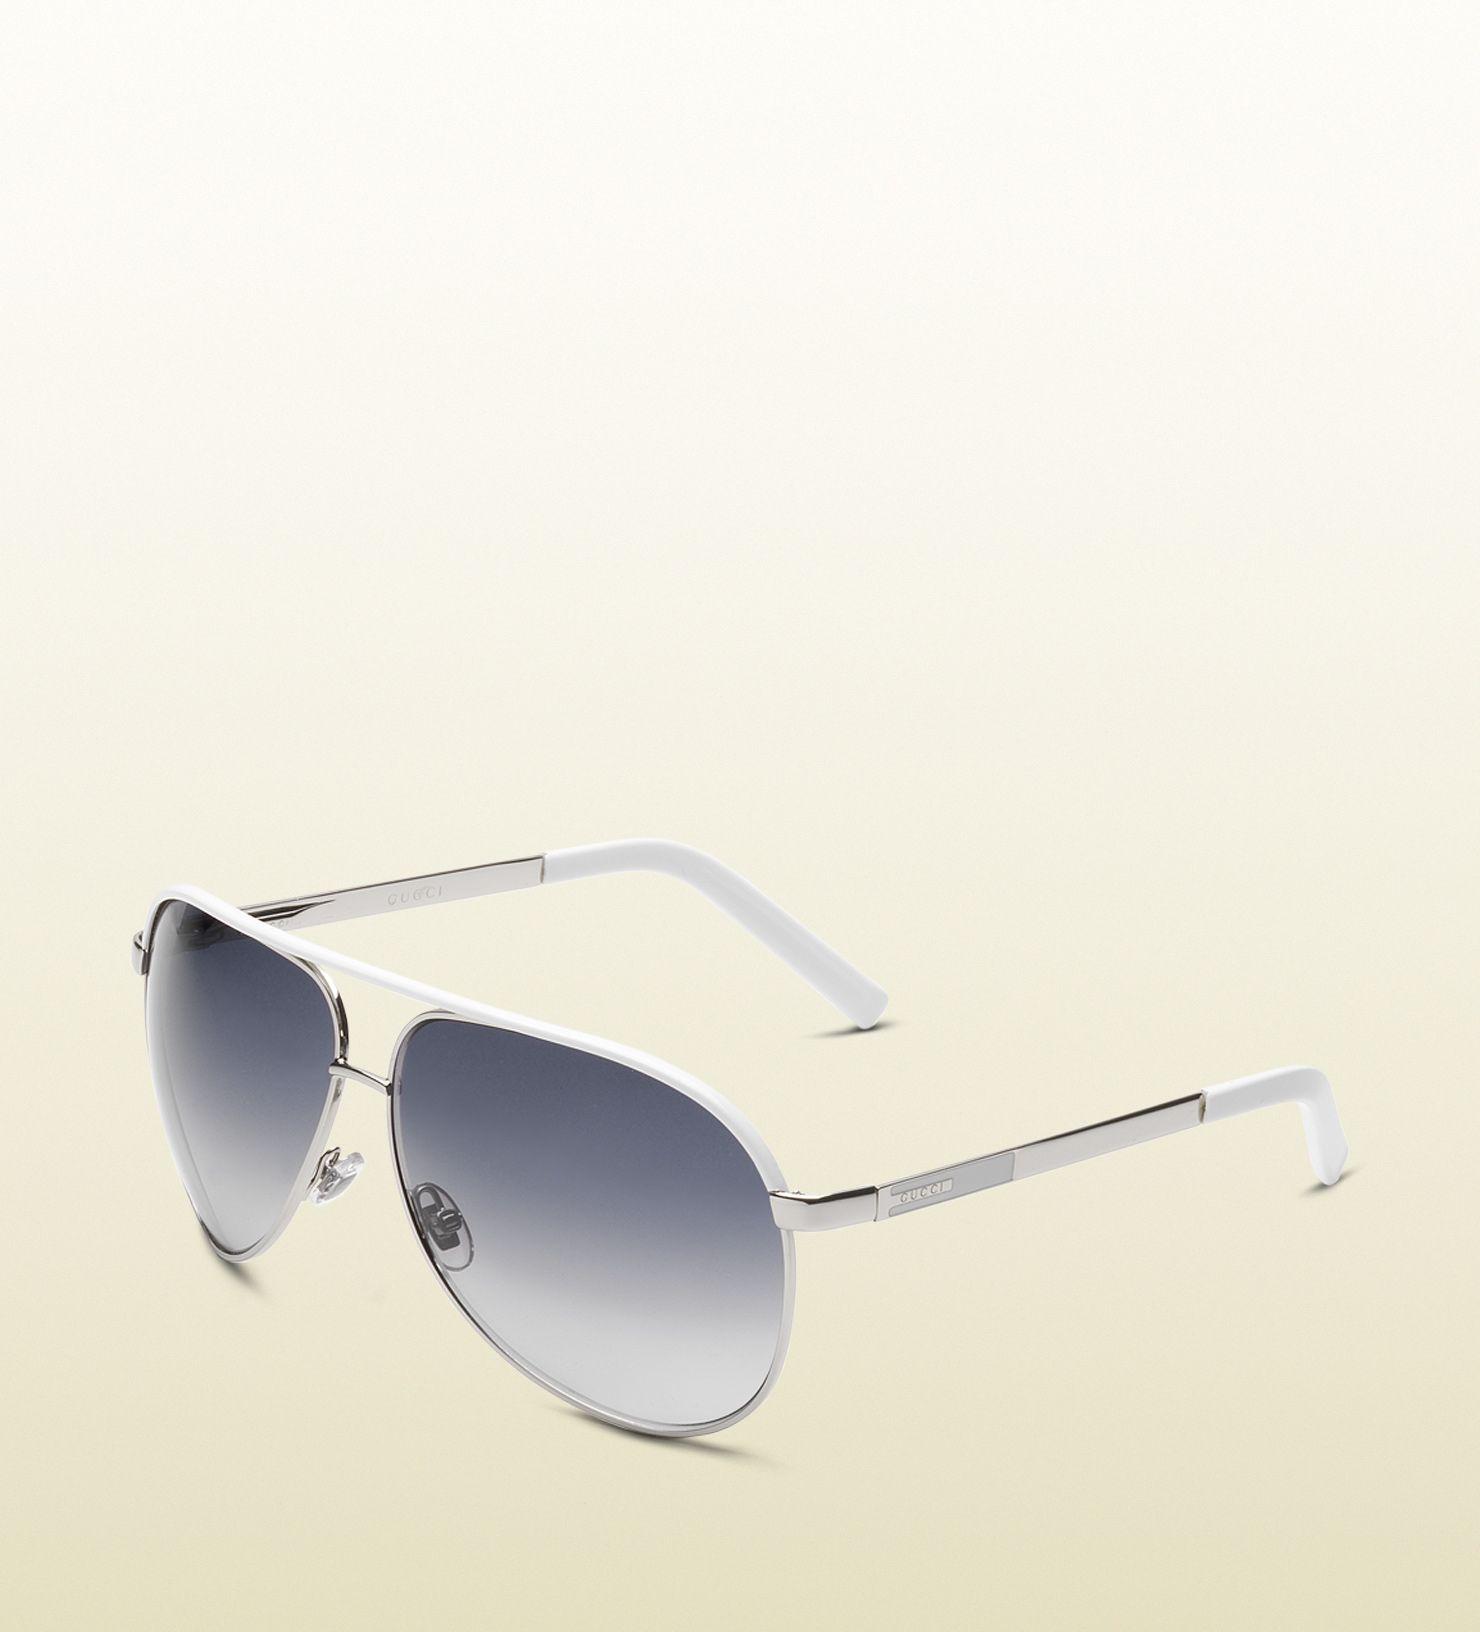 6d13ce08b5f medium aviator sunglasses with gucci logo on temple.